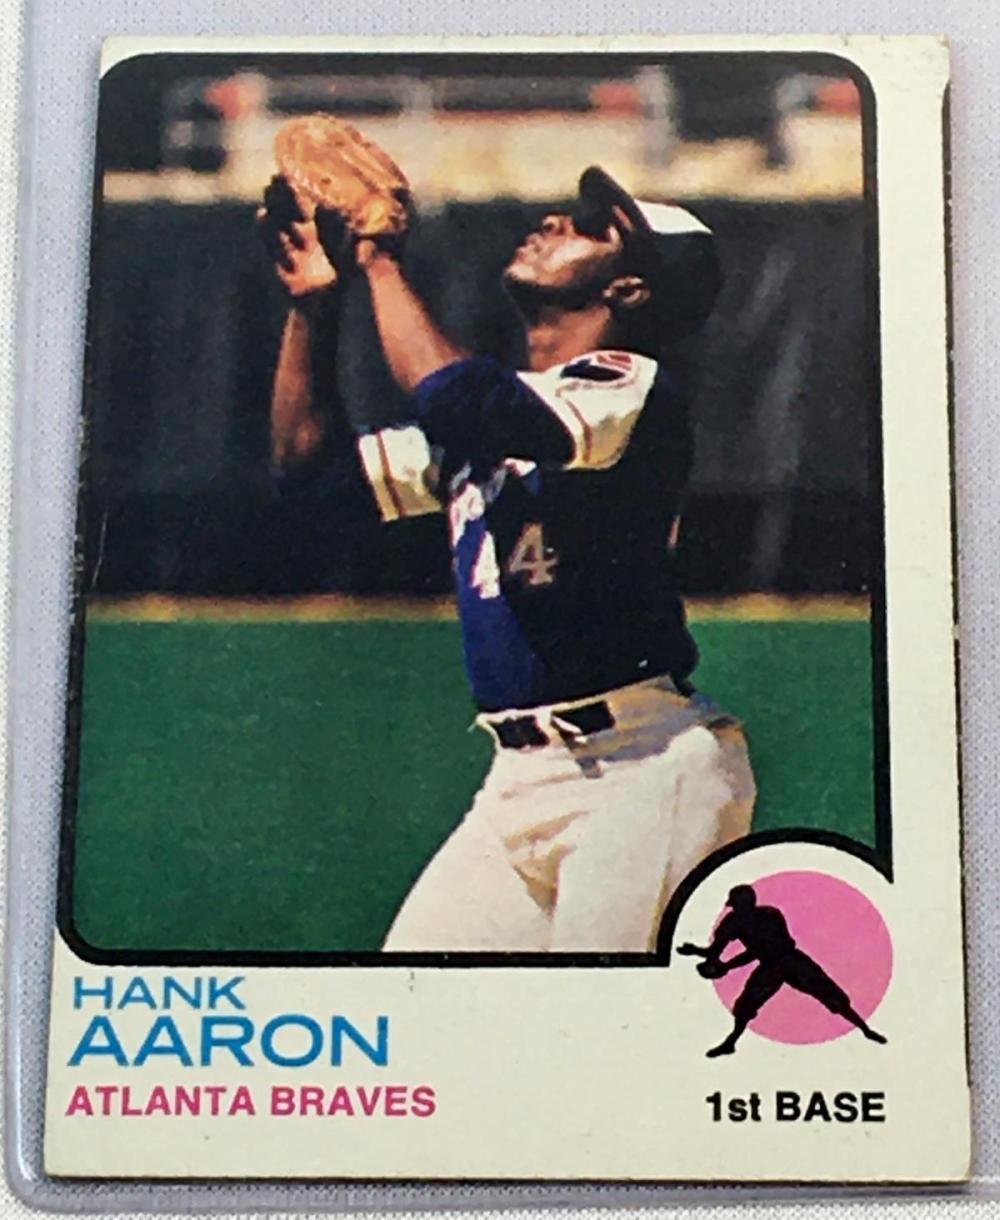 1973 Topps Set Break #100 Hank Aaron Baseball Card